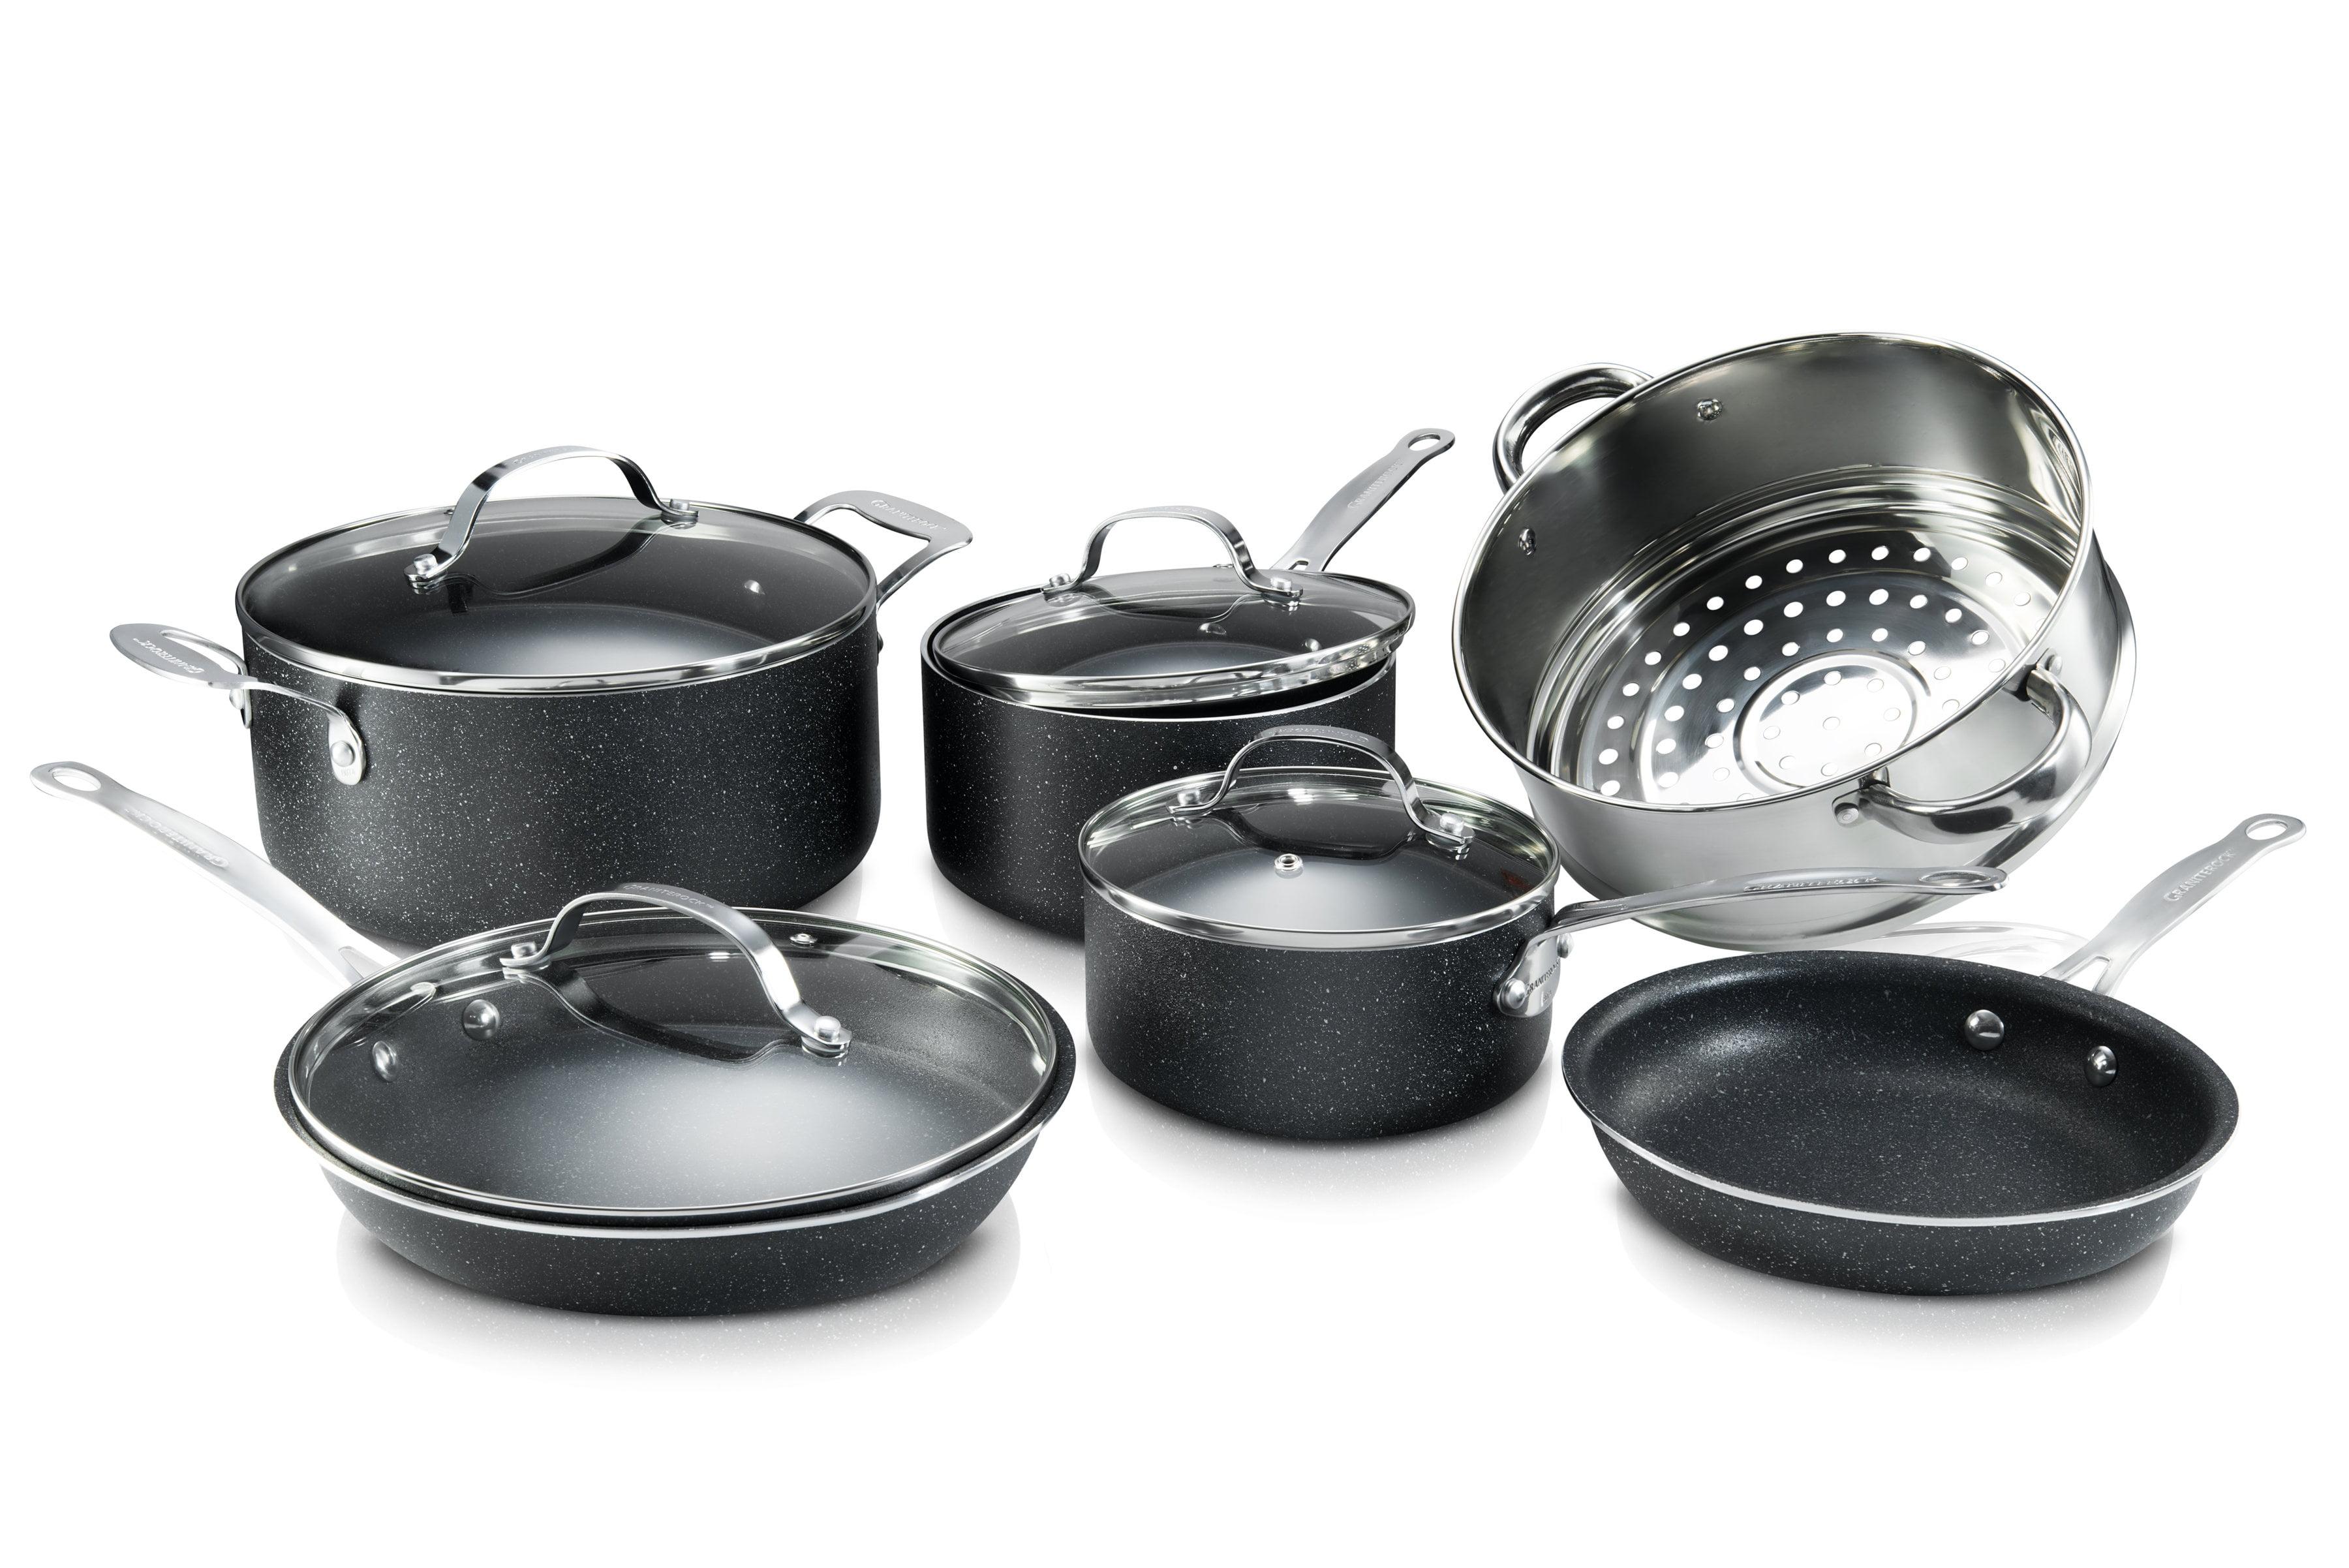 GraniteRock 10-Piece Non-Stick Ultra Durable, Mineral & Granite Coated Scratch Proof Cookware...